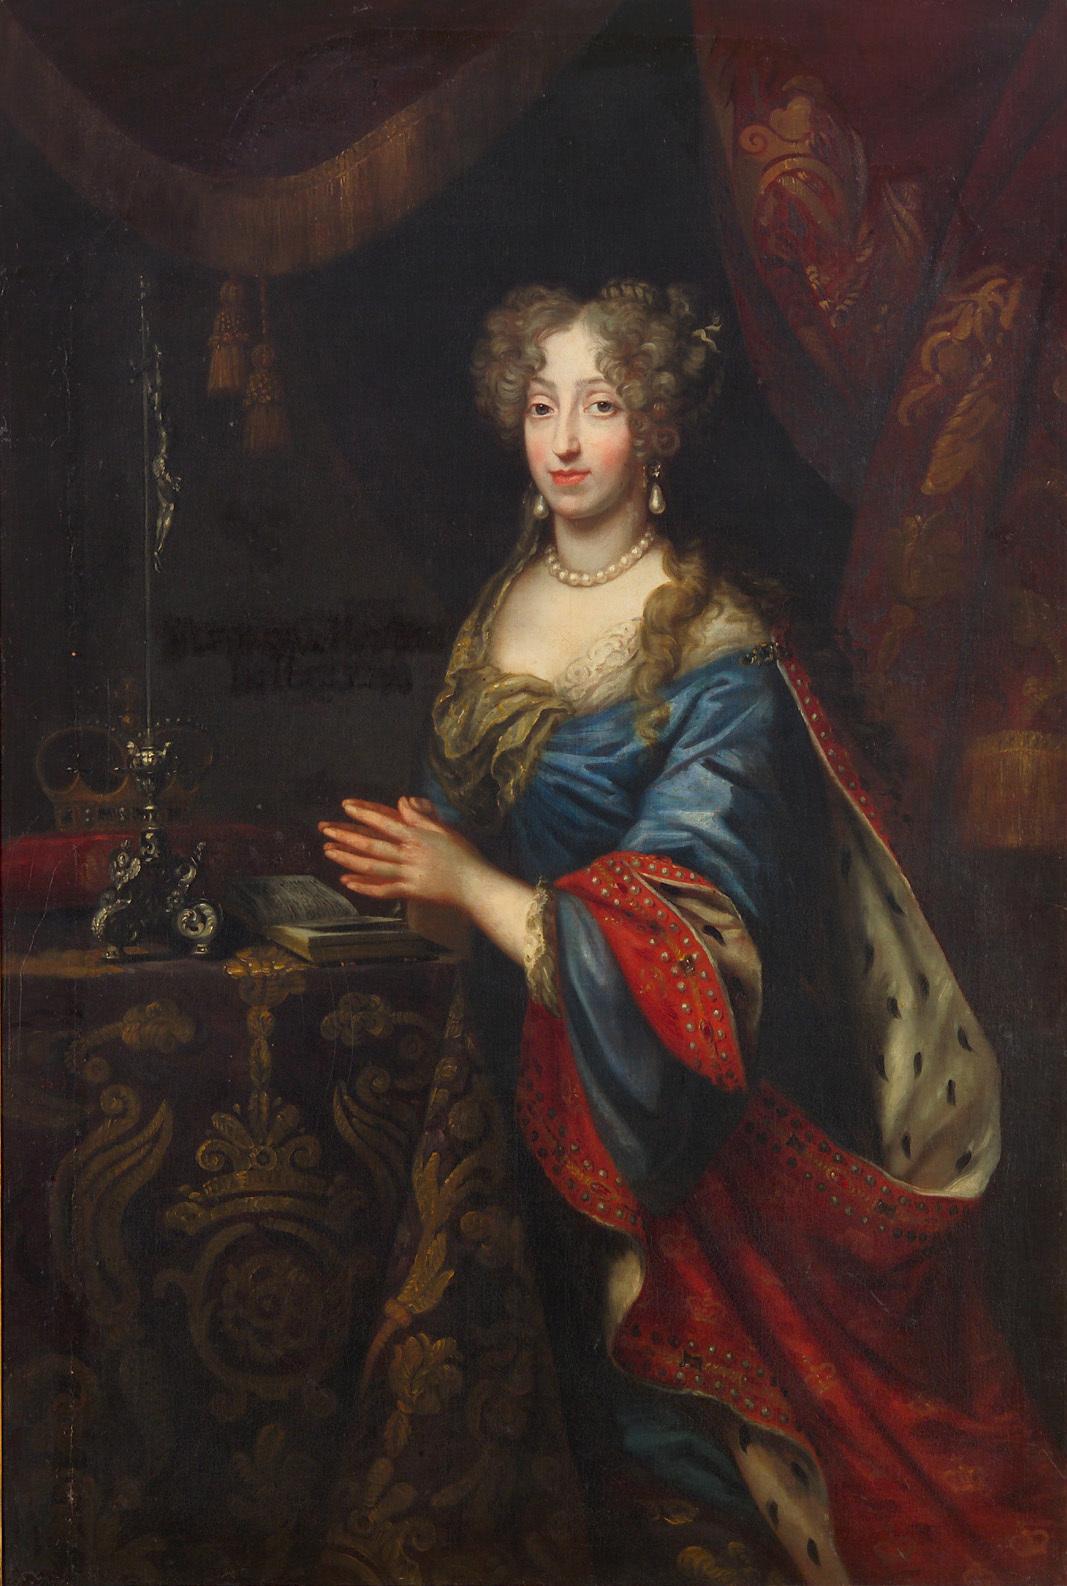 Eleanor of Austria, Queen of Poland - Wikipedia